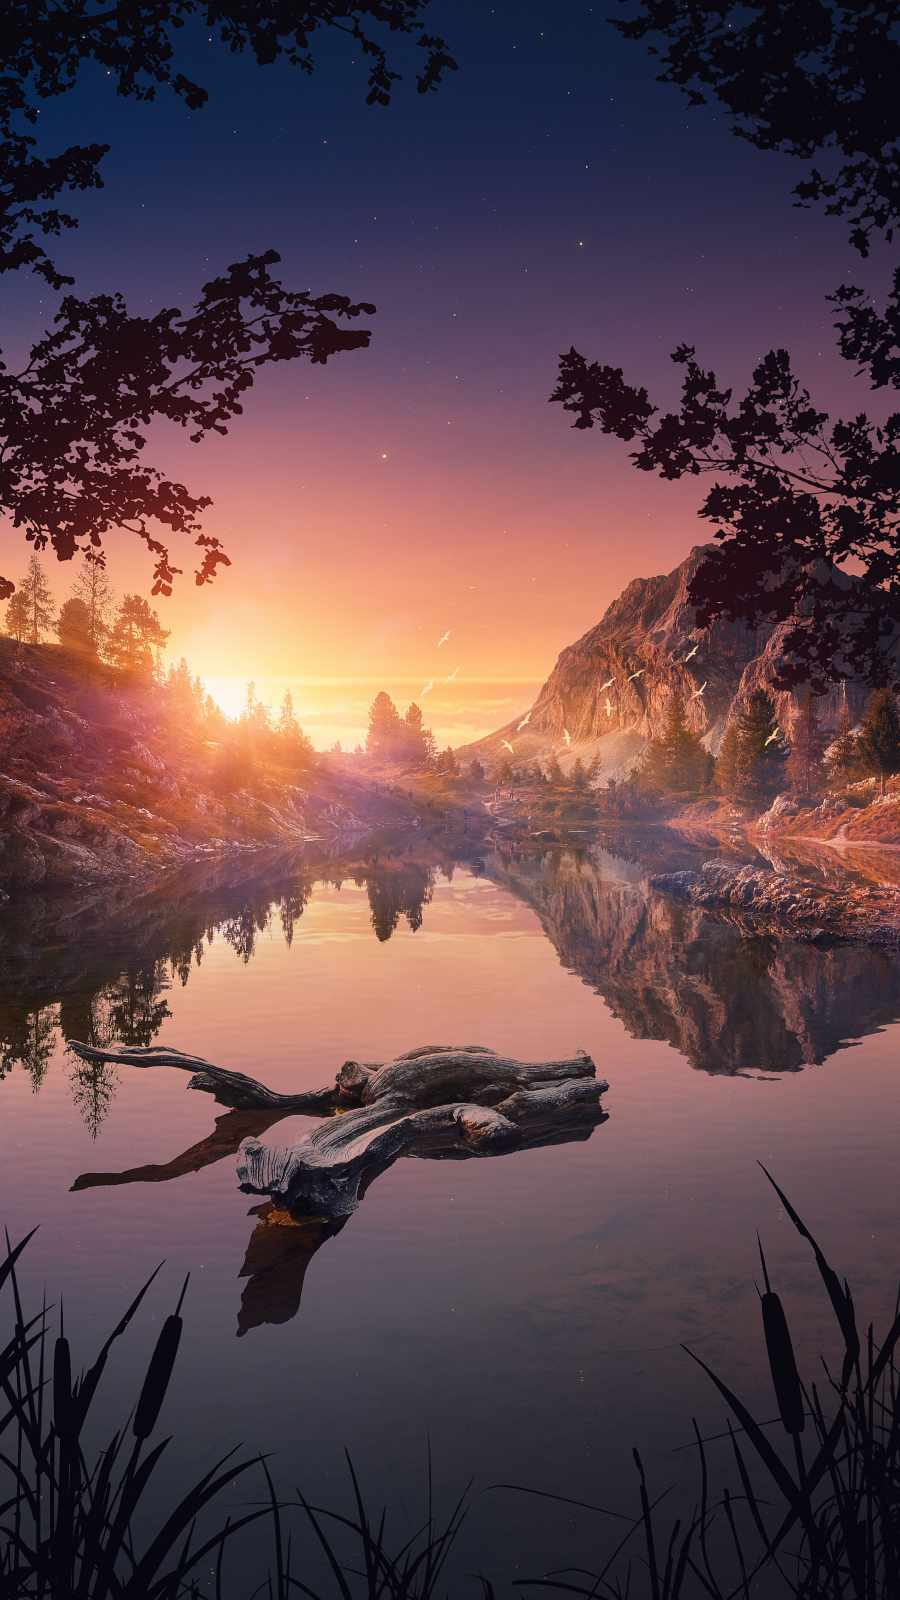 Sunrise Reflection on Water